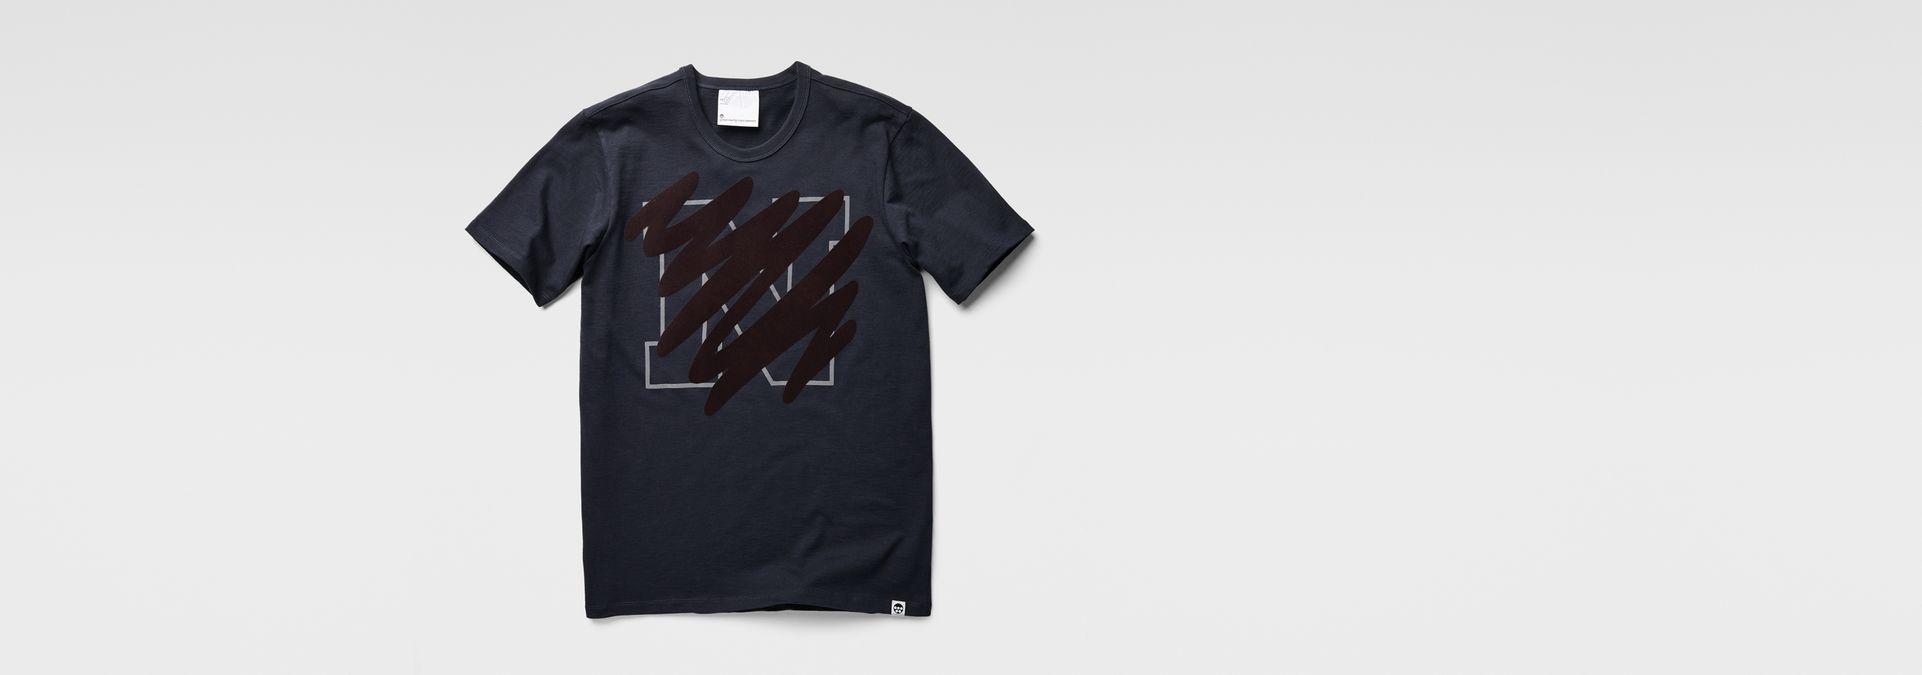 3a35c1bb58 ... G-Star RAW® Marc Newson Scribble T-Shirt Dark blue ...